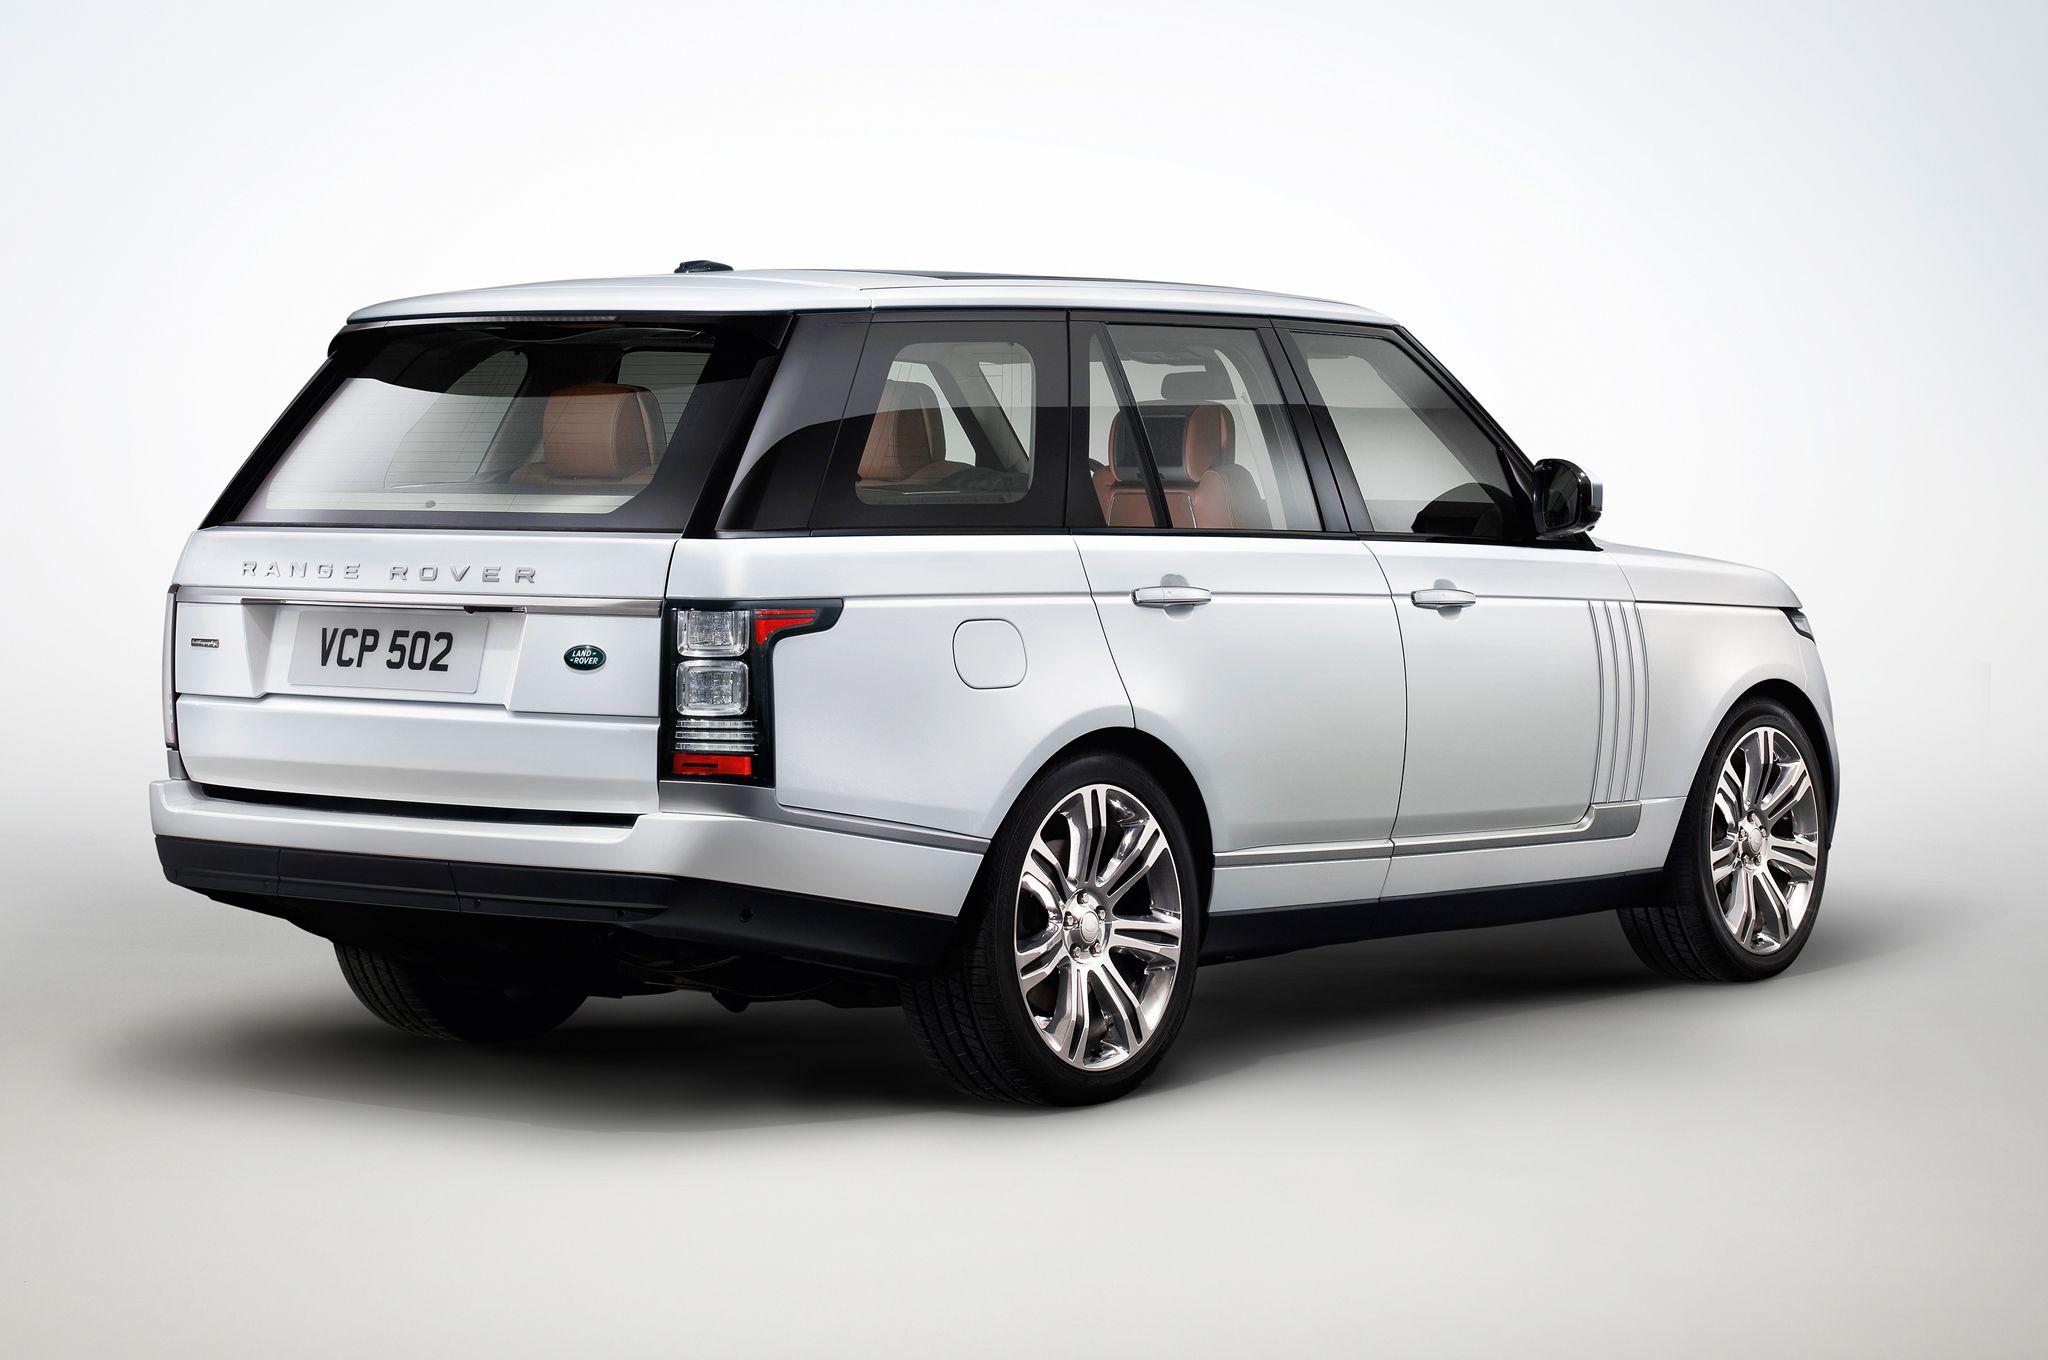 2014 Land Rover Range Rover Image